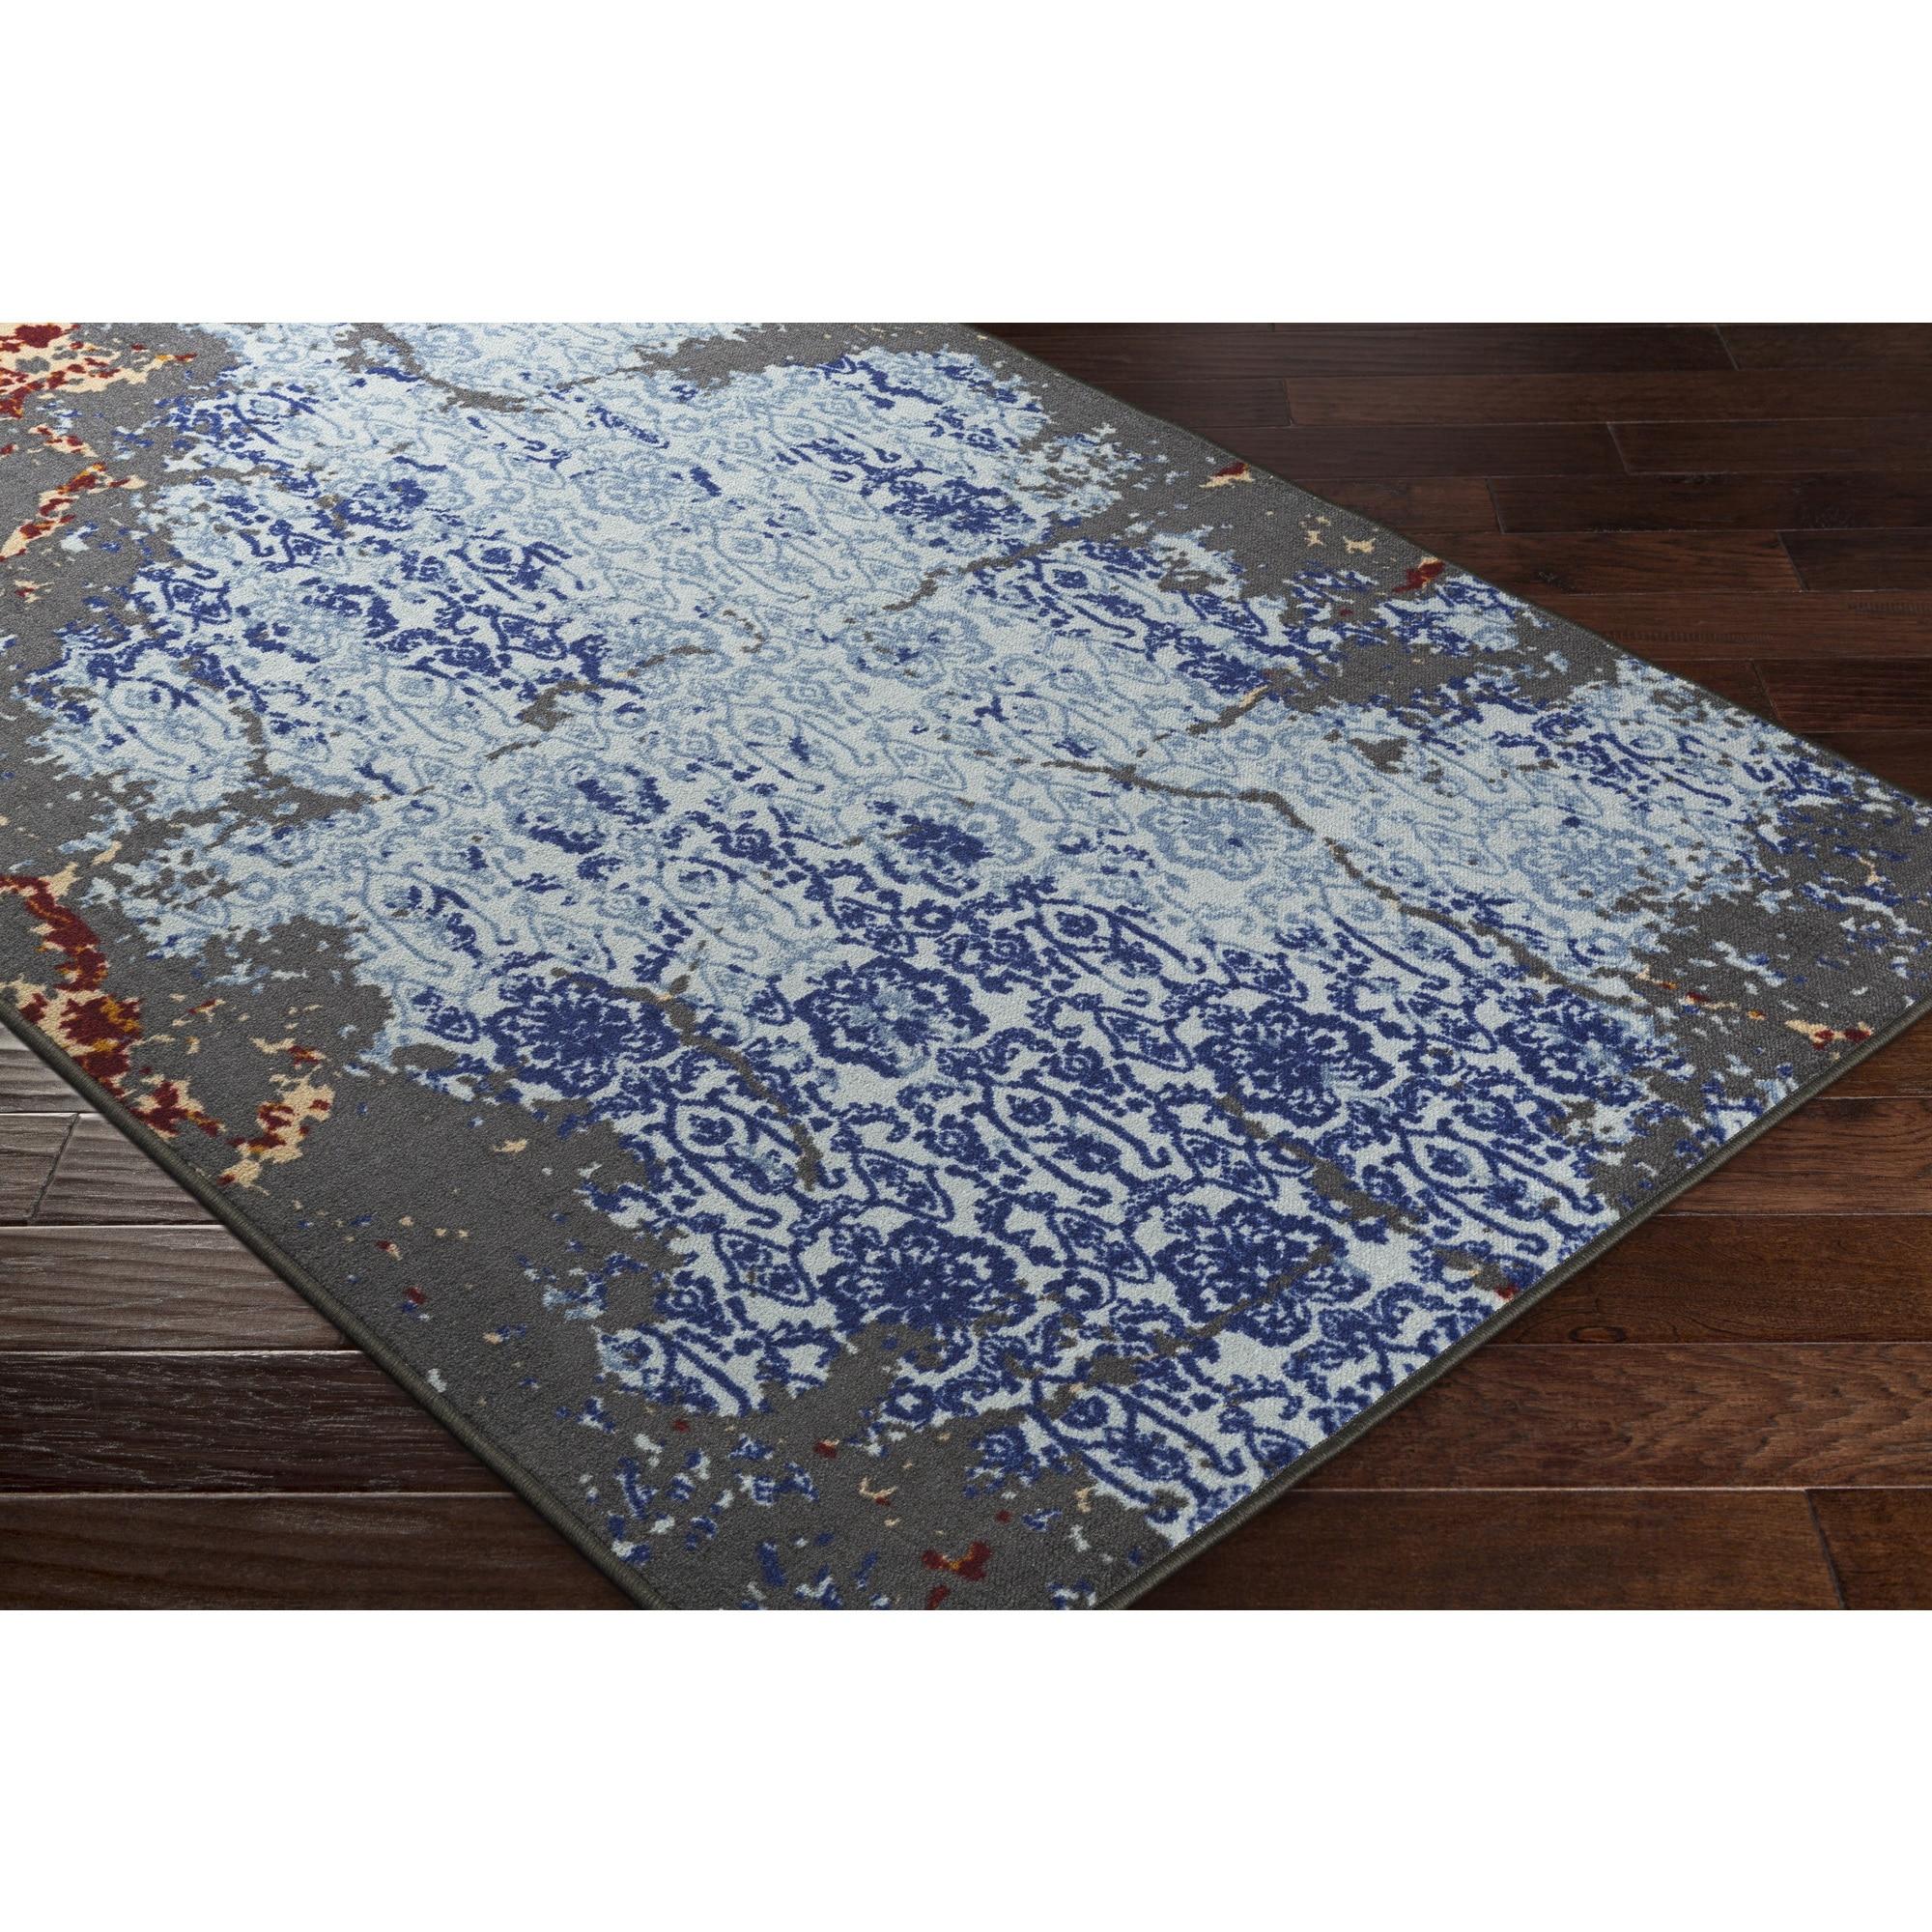 "Surya Carpet, Inc. Machine Woven Atkins Nylon Rug (1'10"" ..."